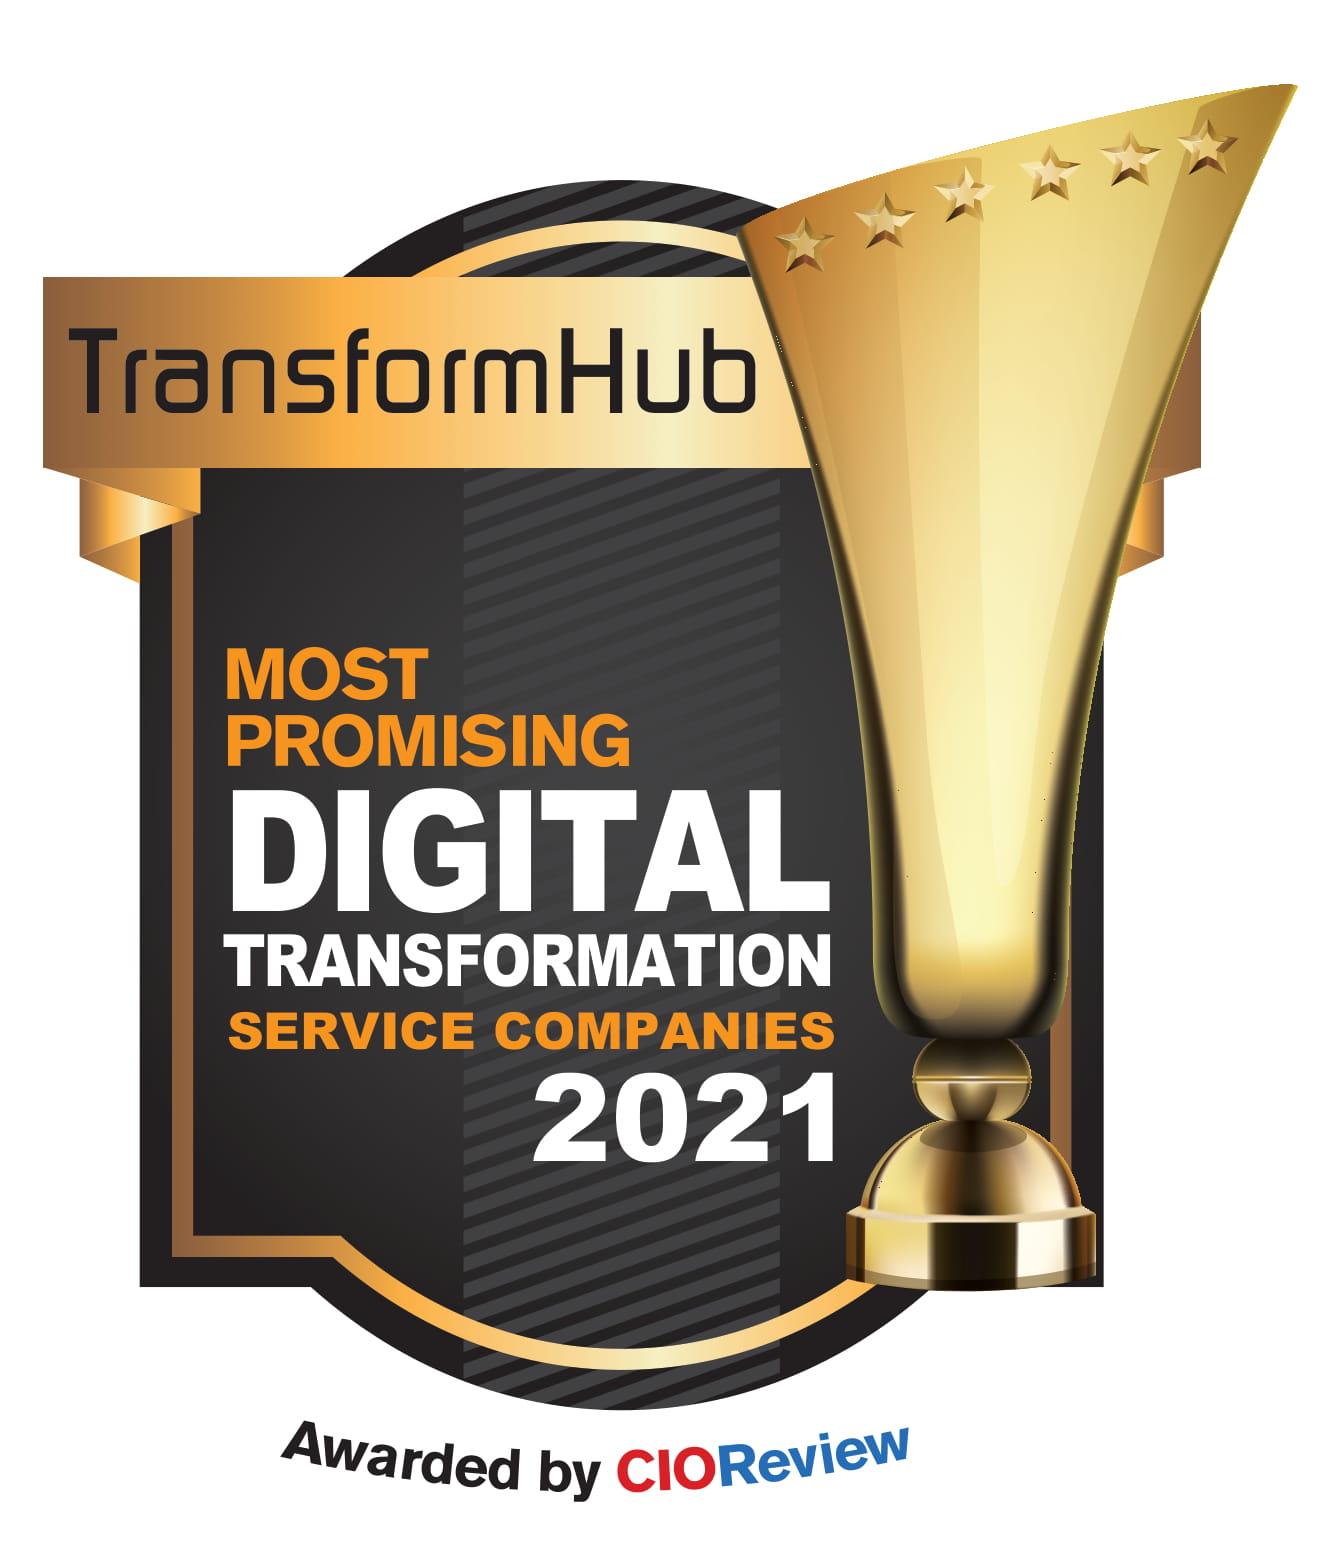 CIO Review Award 2021 TransformHub